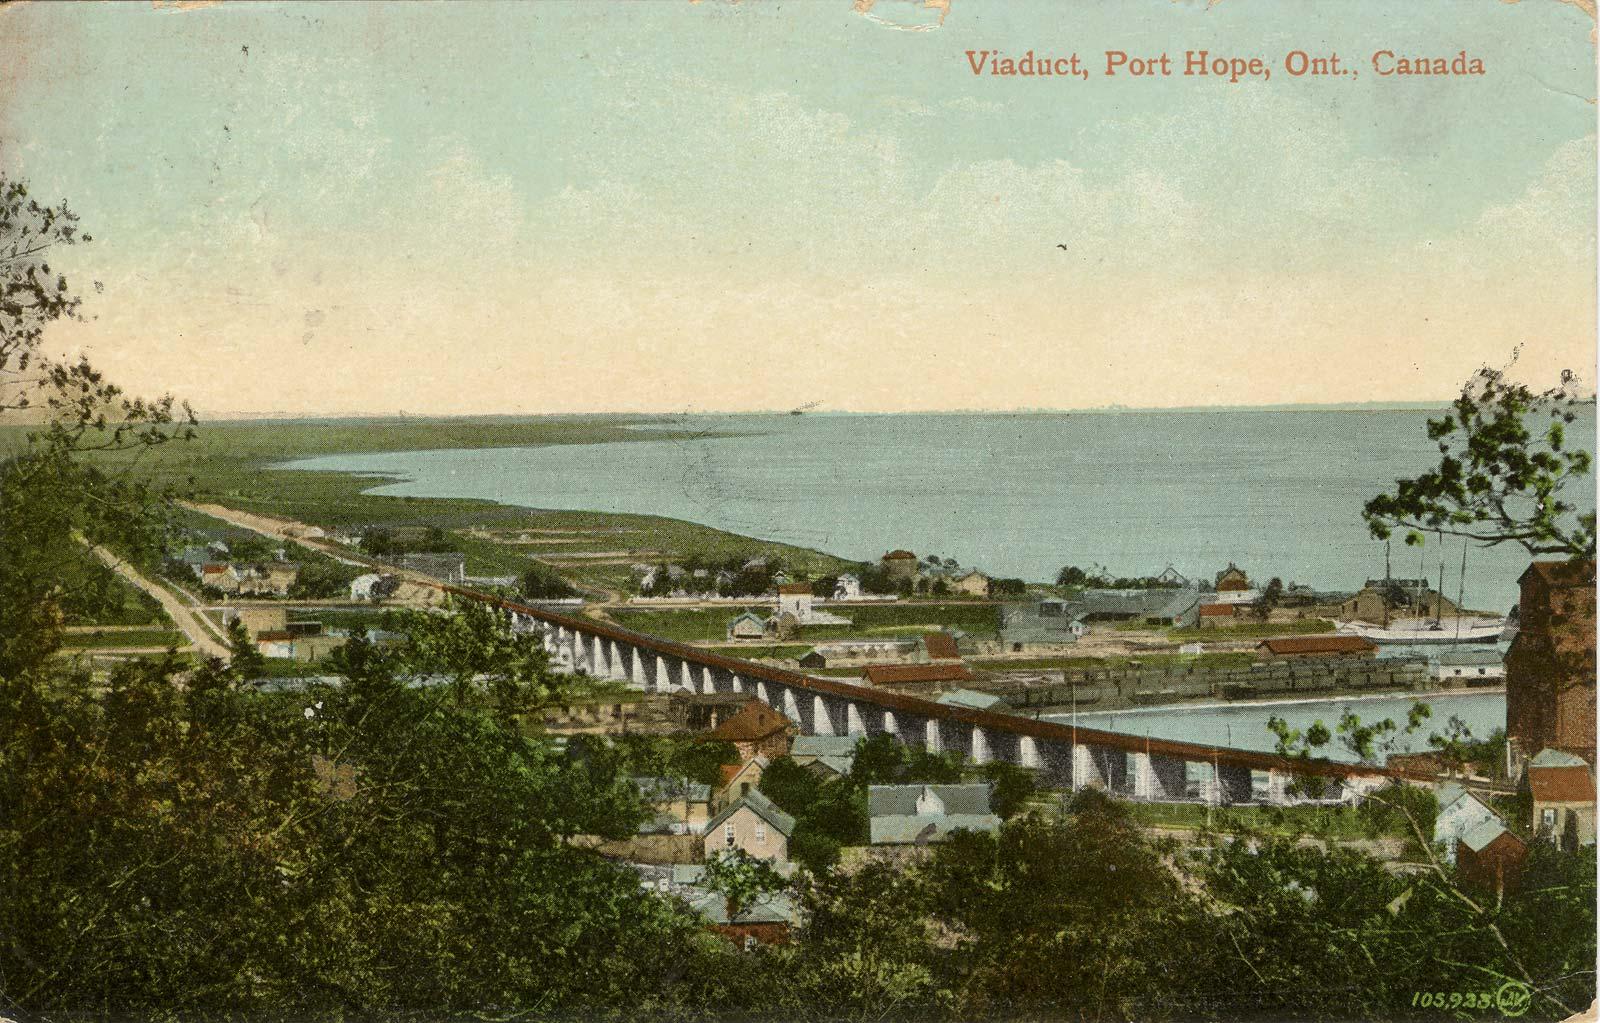 Viaduct, Port Hope, Ont., Canada